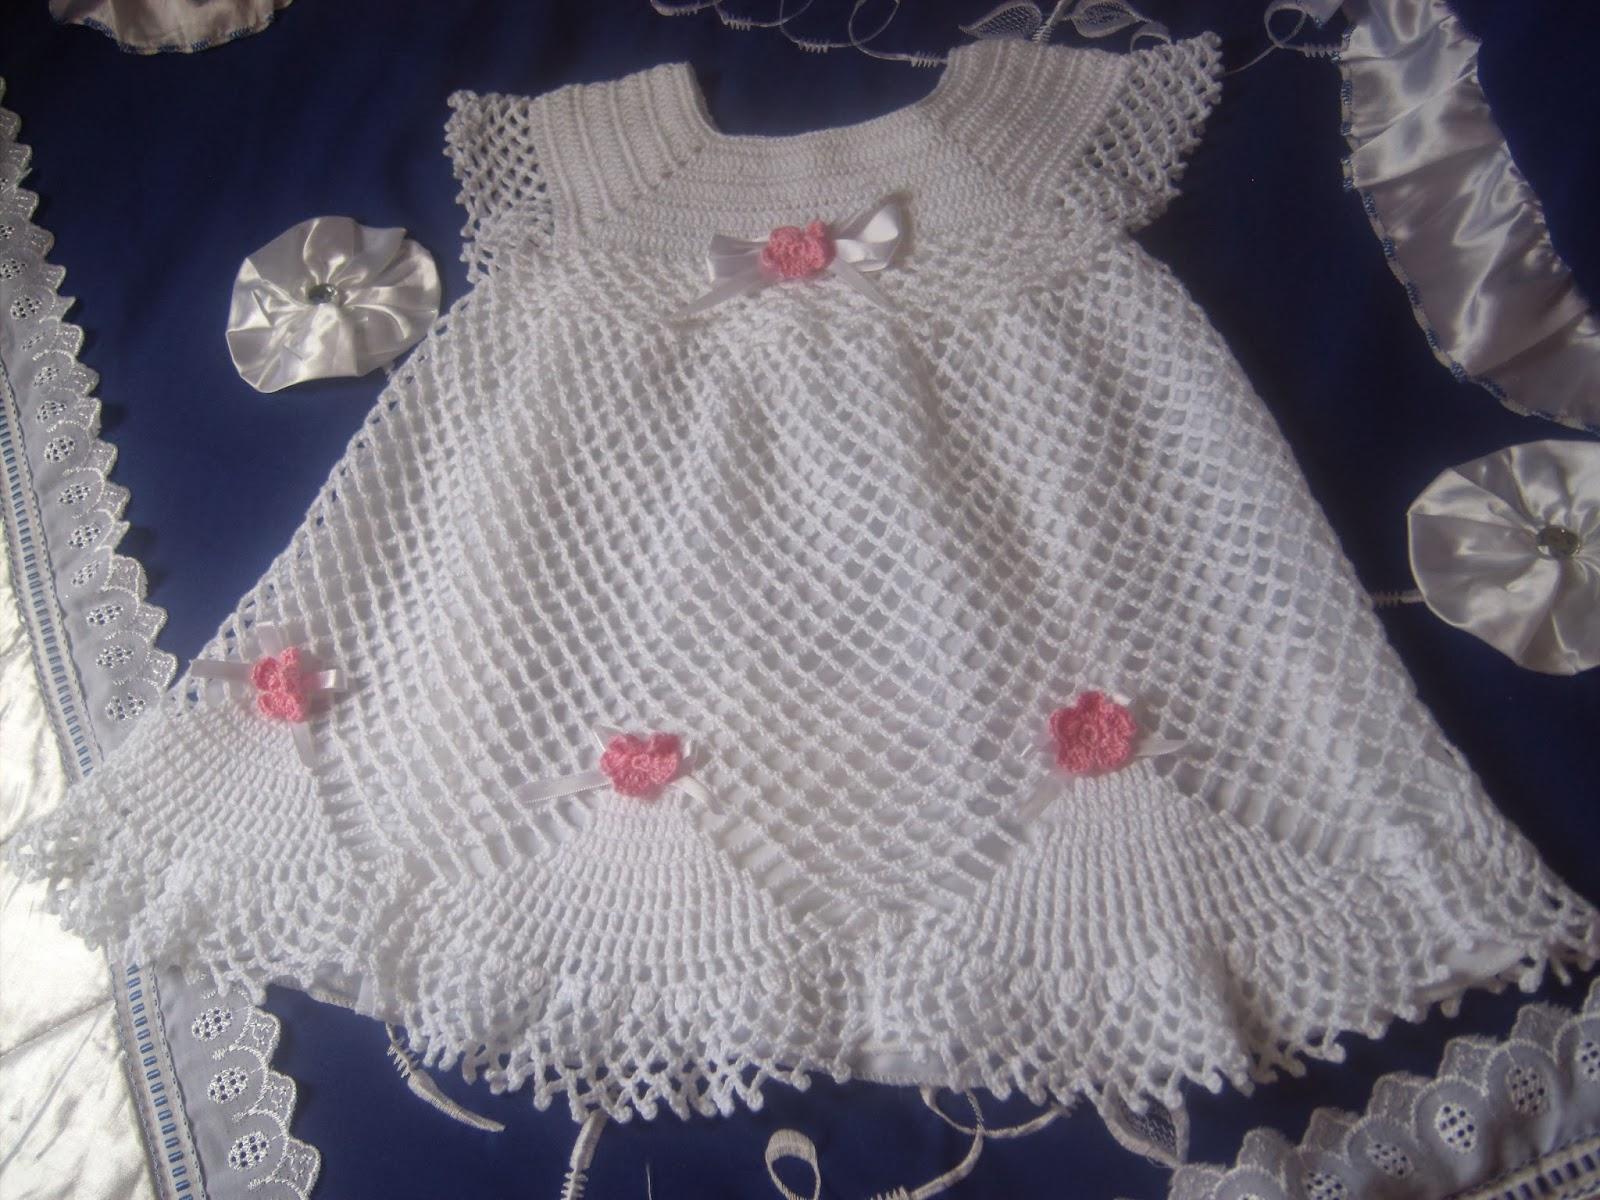 Suficiente Croche da Moda : Vestido de crochê infantil SC83